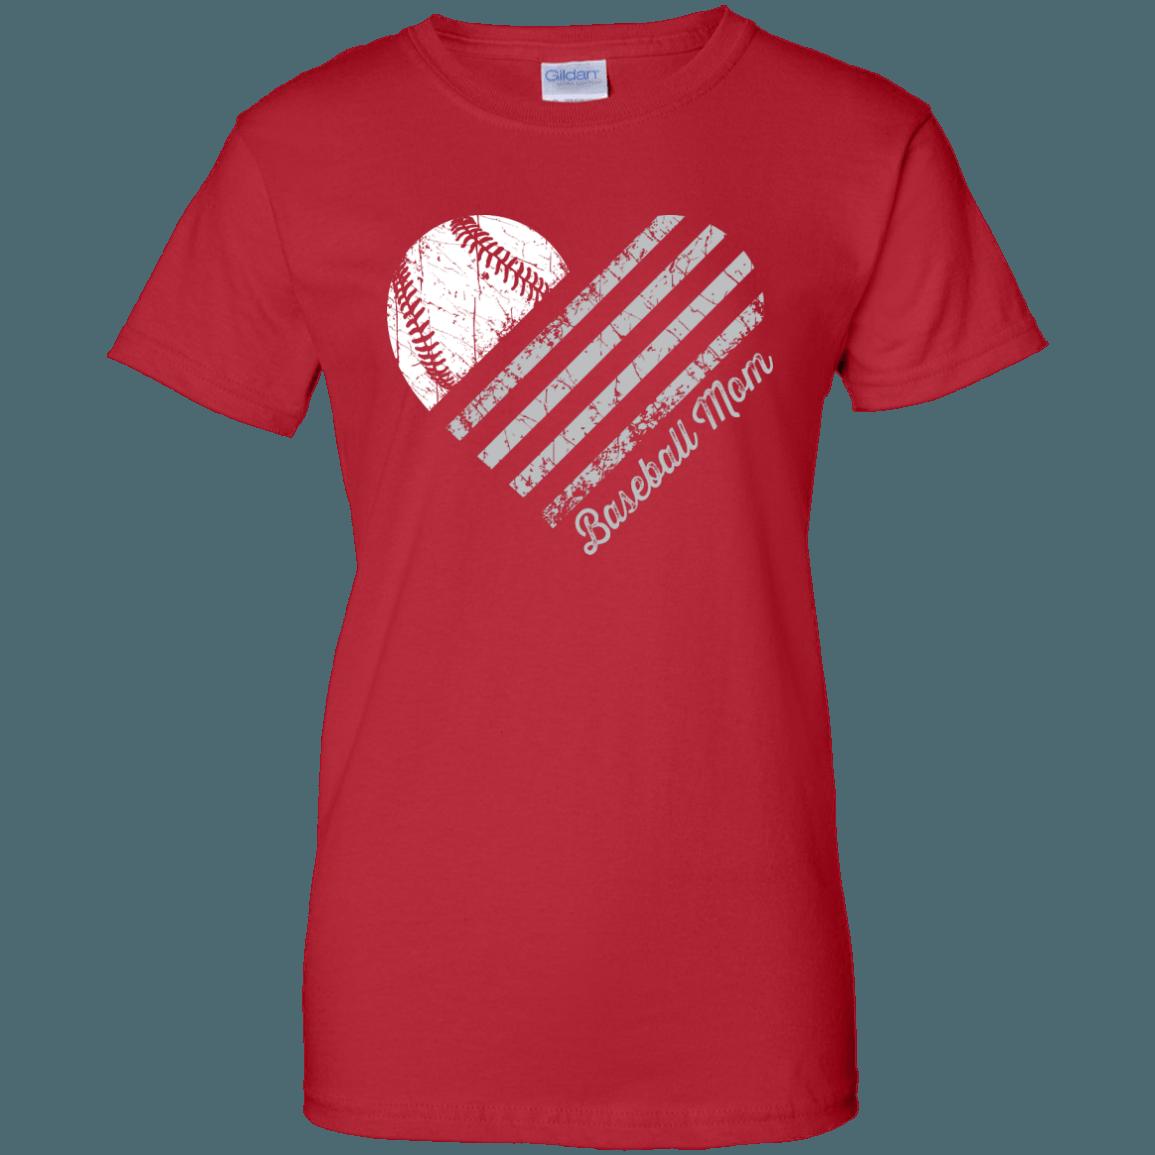 Proud baseball mom shirts clipart banner transparent library Heart Flag - Baseball - Women's Relaxed Fit | Tshirt | Pinterest banner transparent library